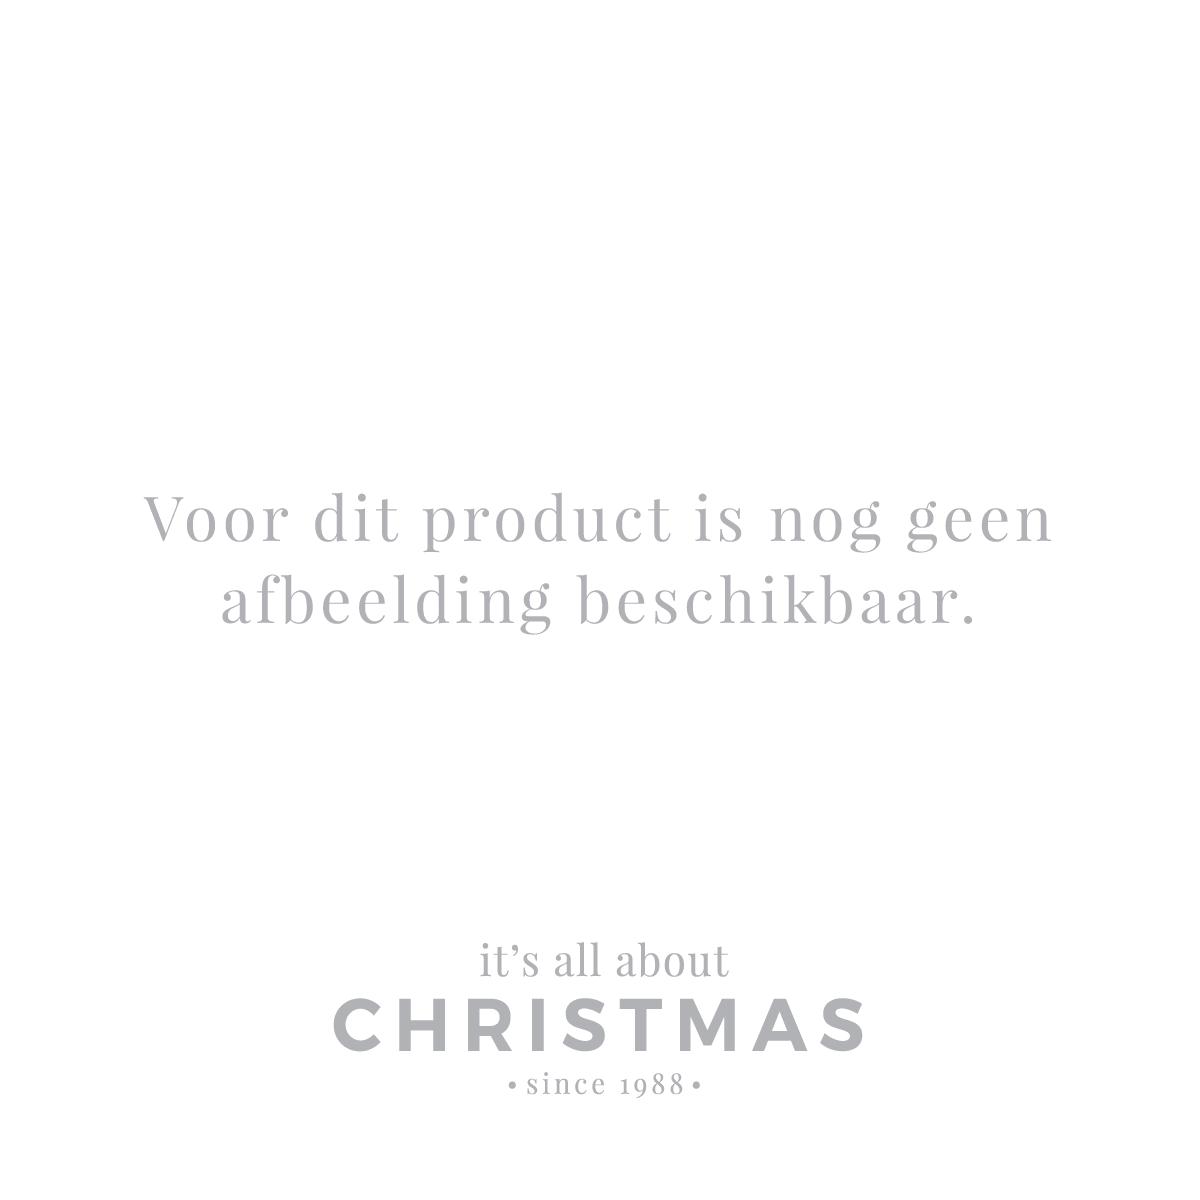 Aufbewahrungsbox Weihnachtskugeln.44 Christbaumkugeln Glas Taupe In Koffer It S All About Christmas